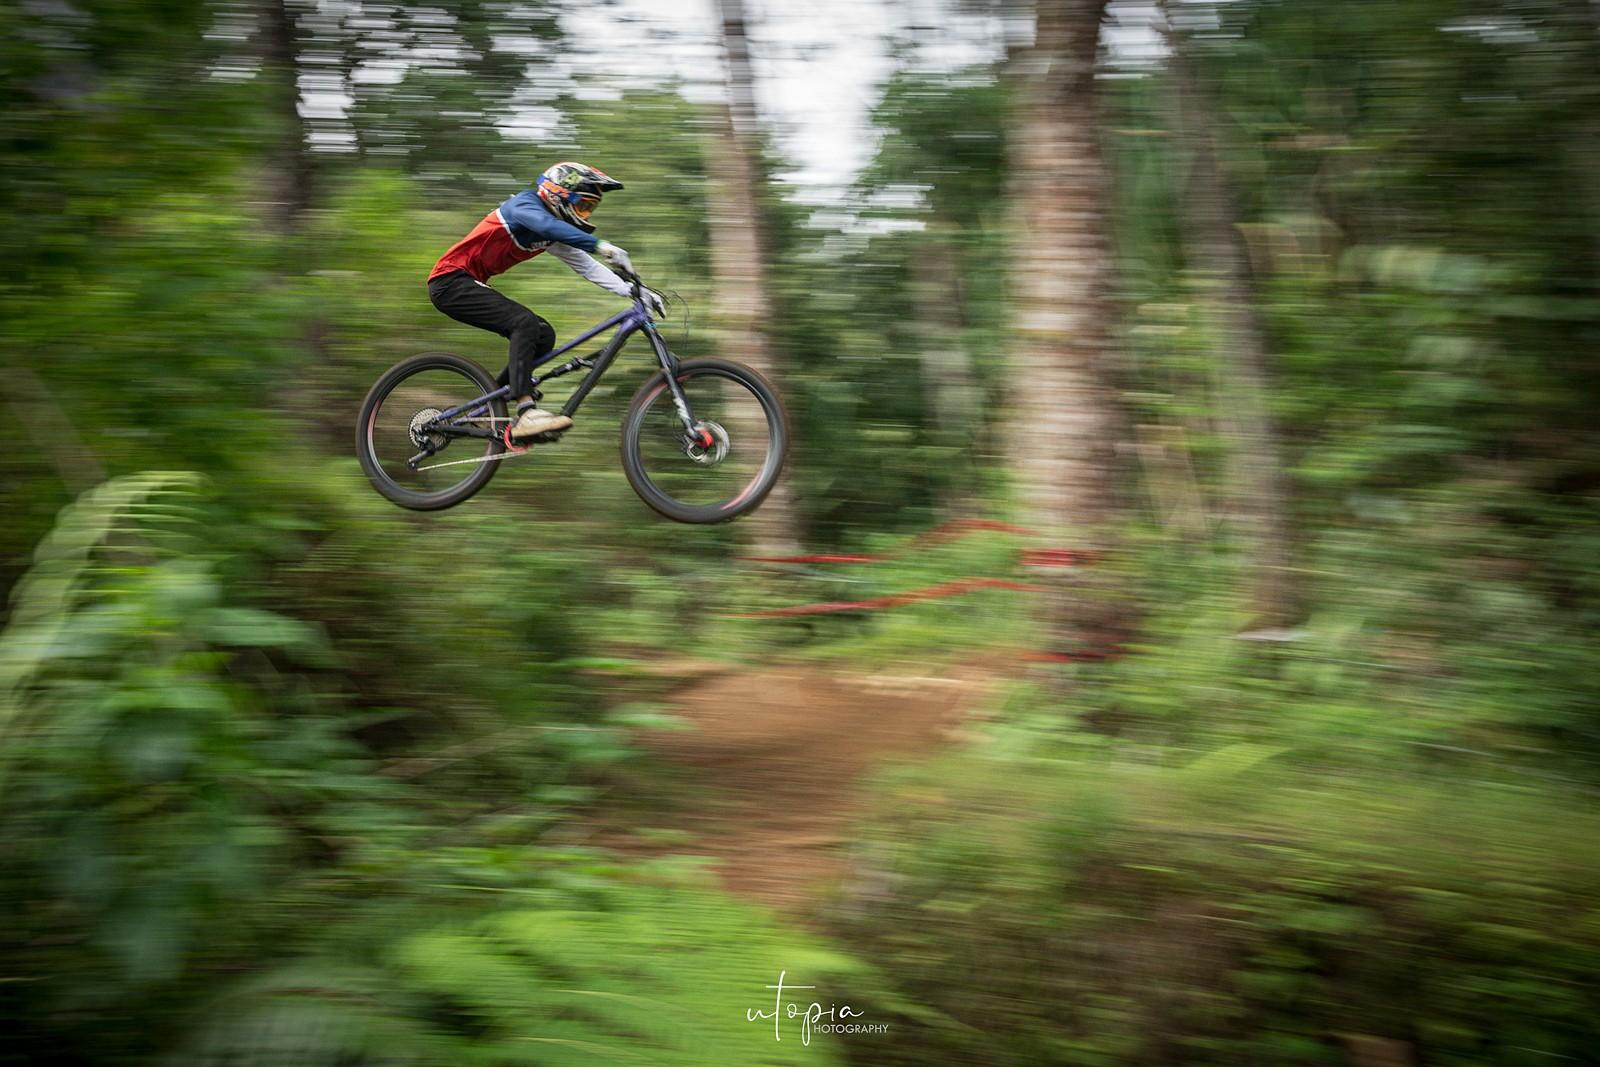 The Blur Jump - utopiaarch - Mountain Biking Pictures - Vital MTB